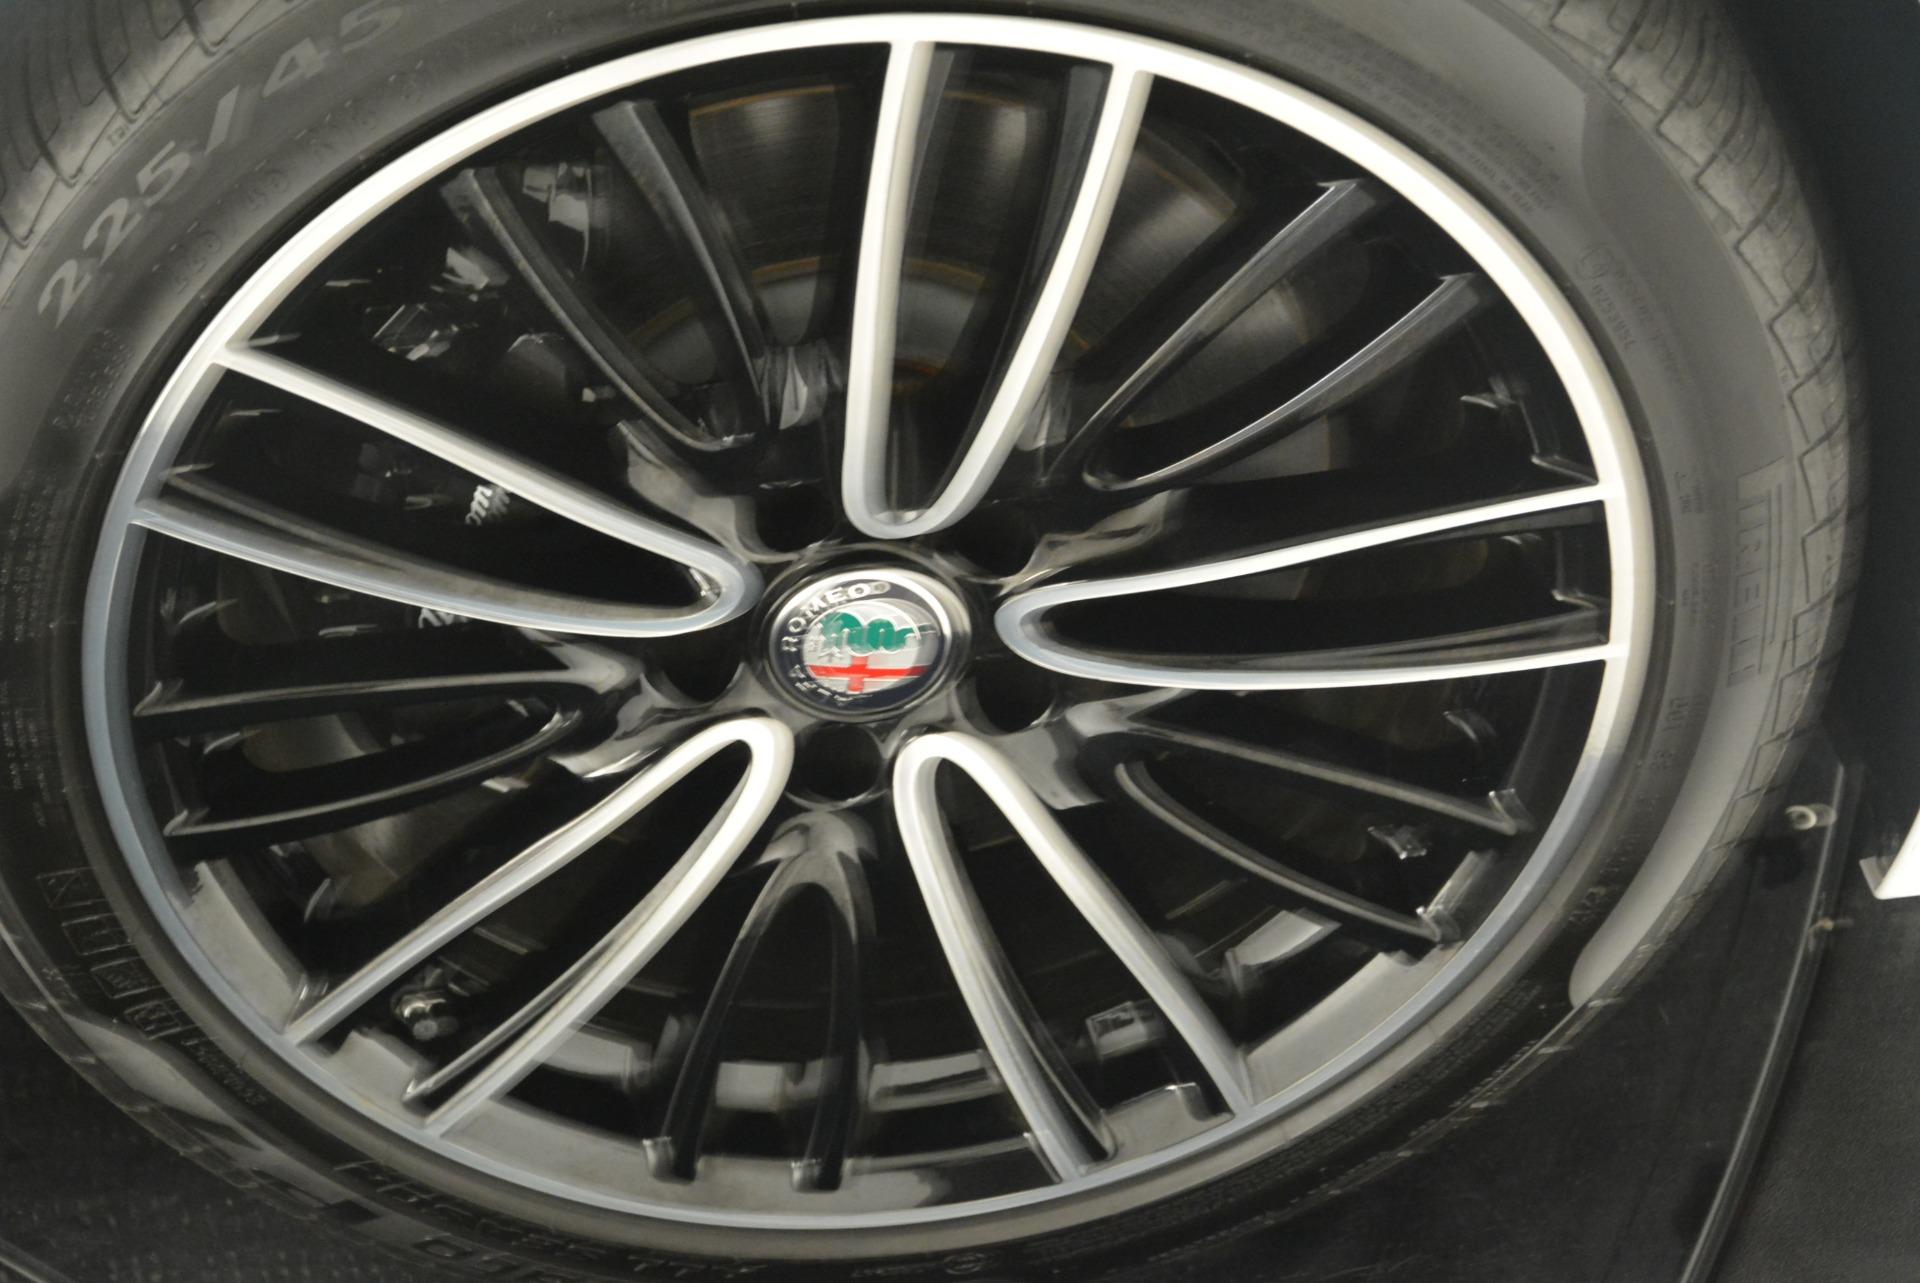 New-2018-Alfa-Romeo-Giulia-Ti-Lusso-Q4